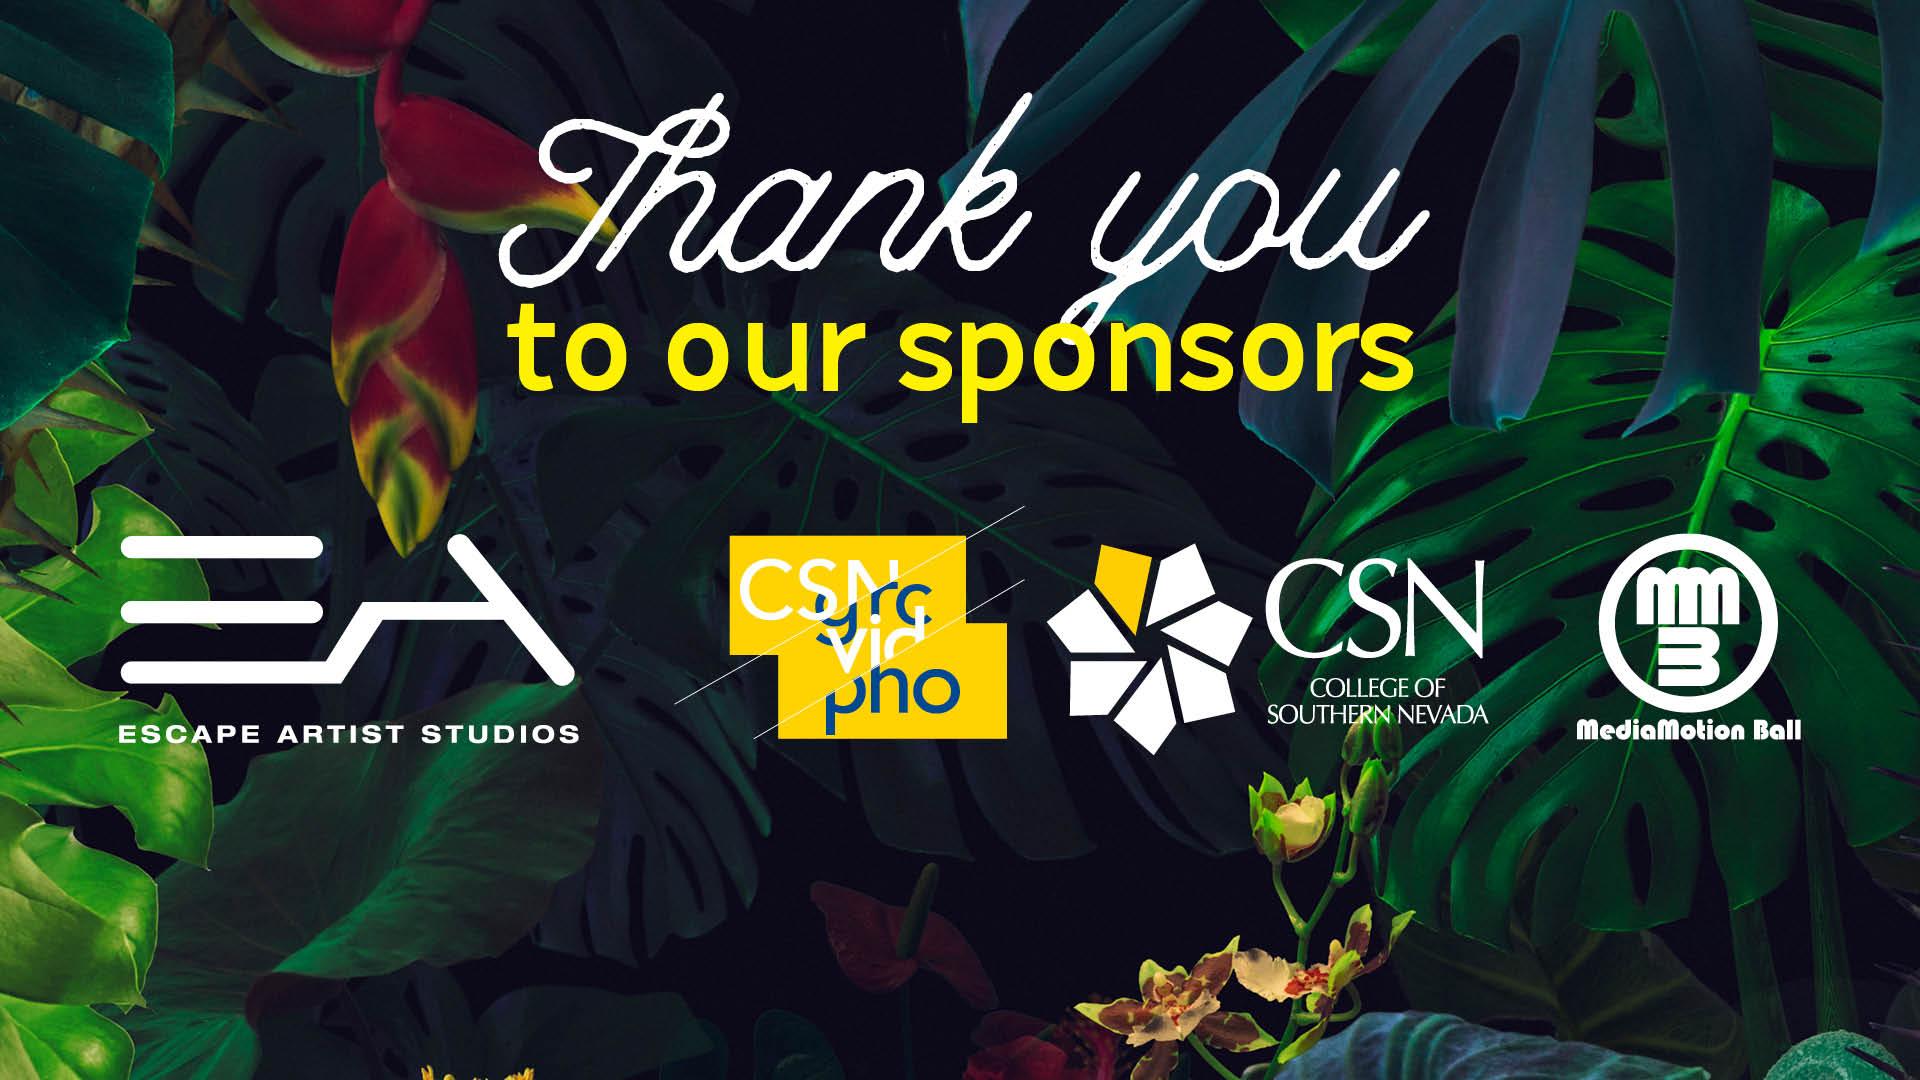 Lush - FB assets - 1920x1080-sponsors.jpg